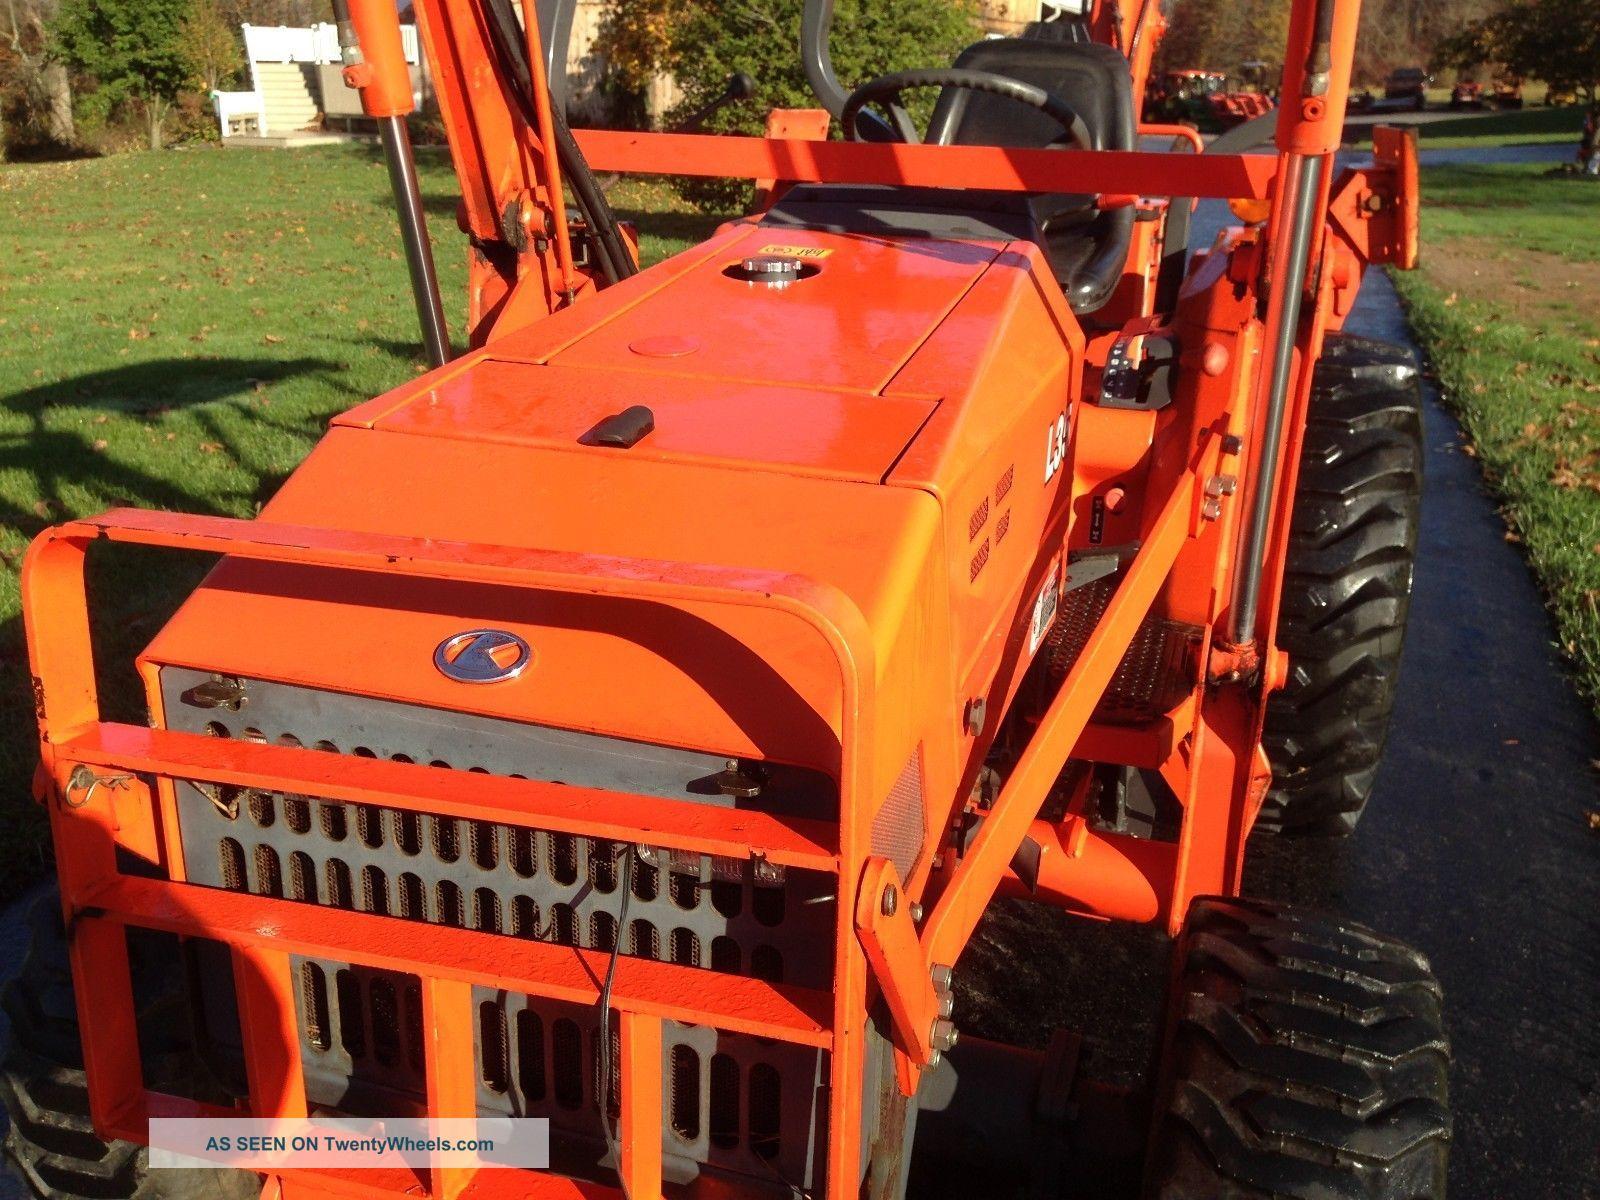 L35 Kubota 3 Point Hitch Pic : Kubota l commercial duty tractor loader backhoe